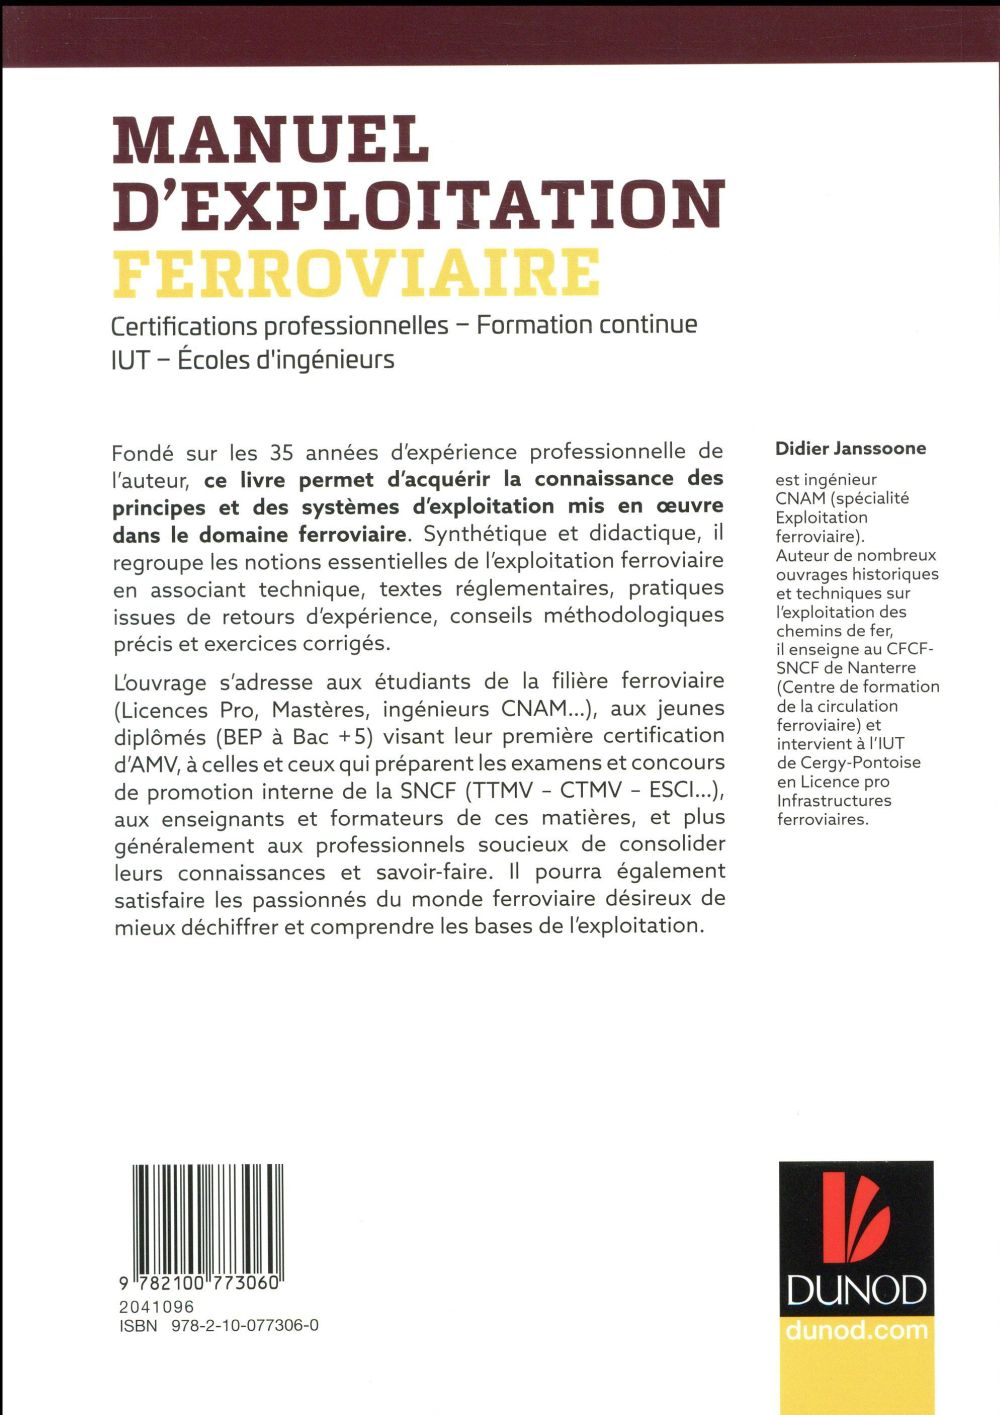 Manuel d'exploitation ferroviaire ; certifications AMV, TTMV, CTMV